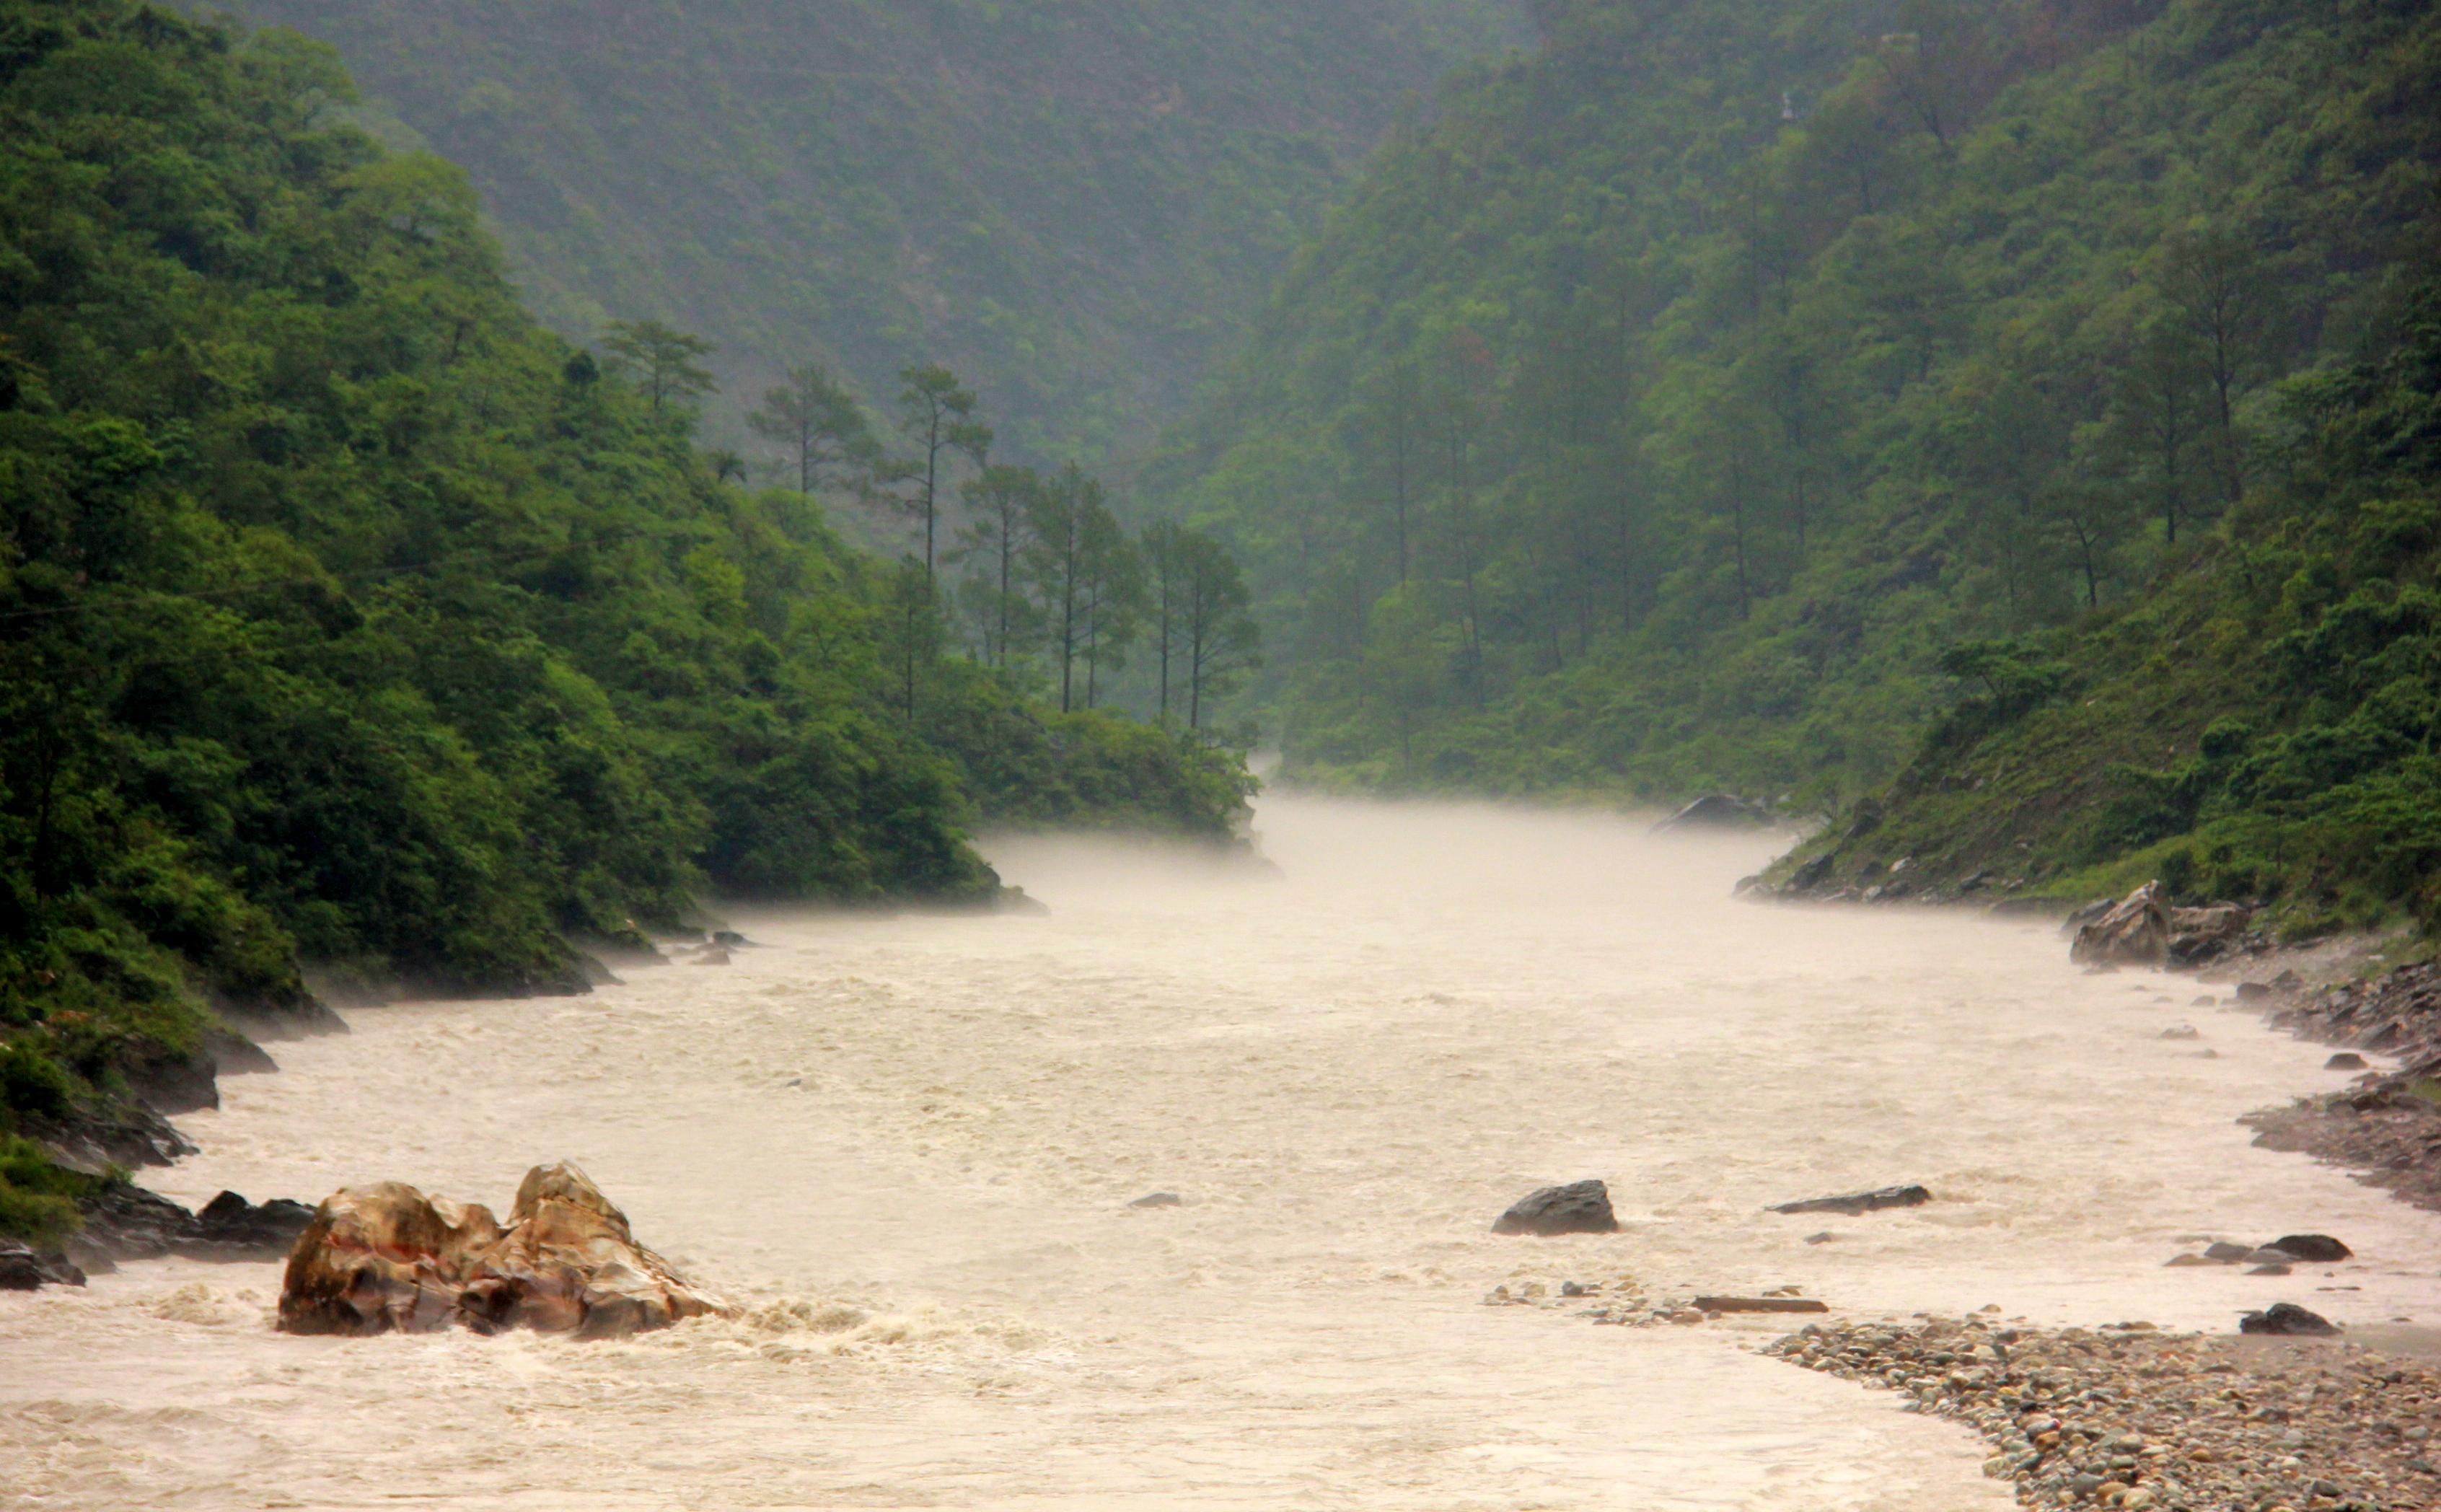 Misty rivers